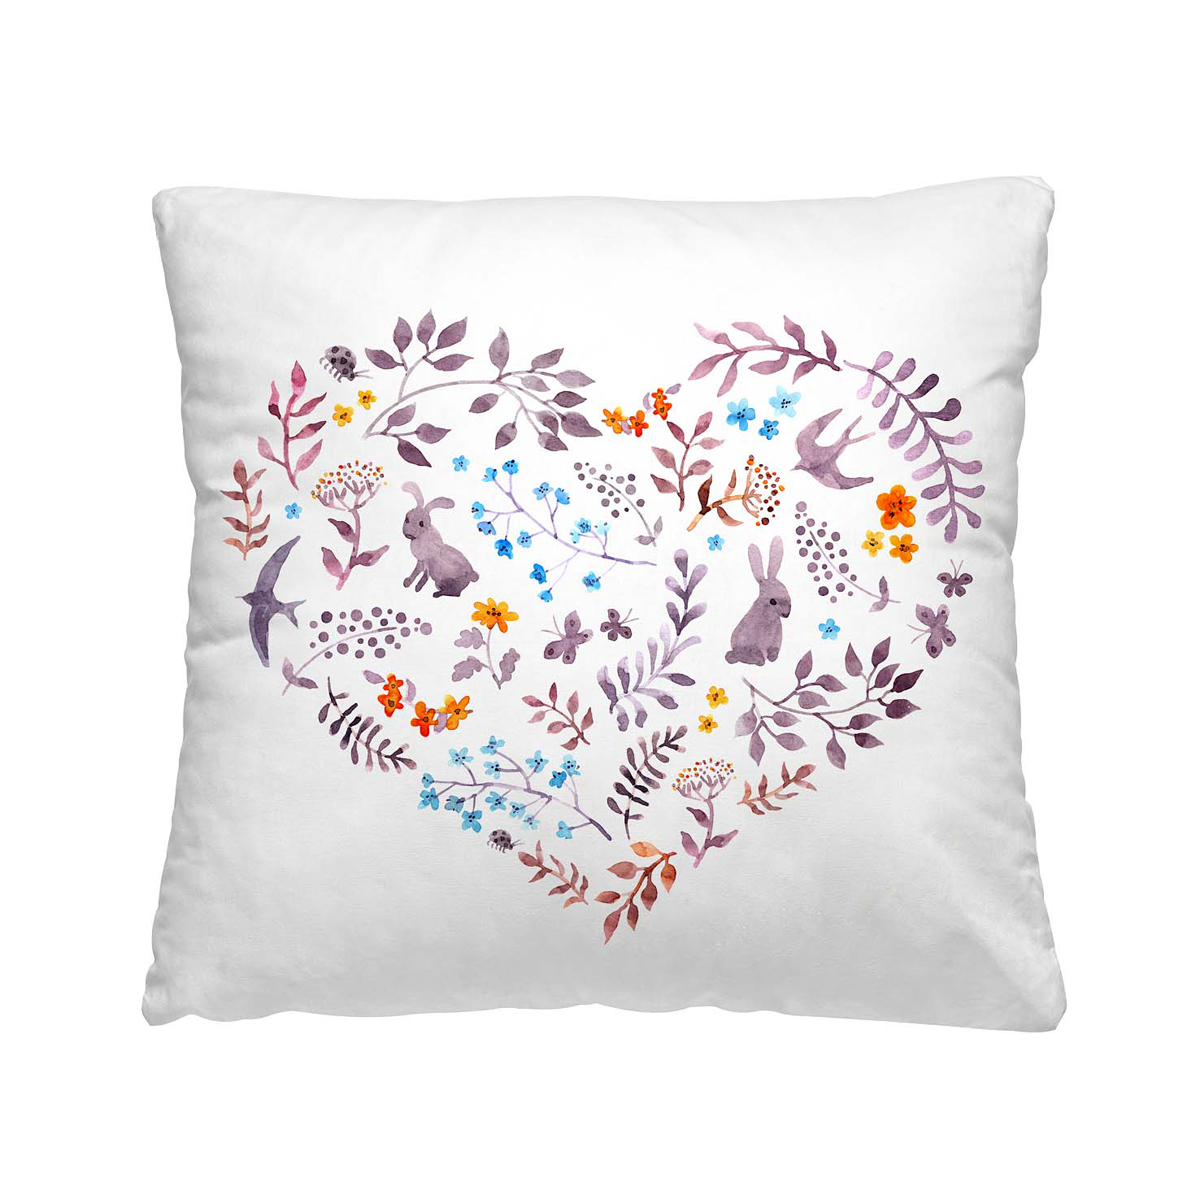 Подушка декоративная Волшебная ночь Сердце, 40х40 см197